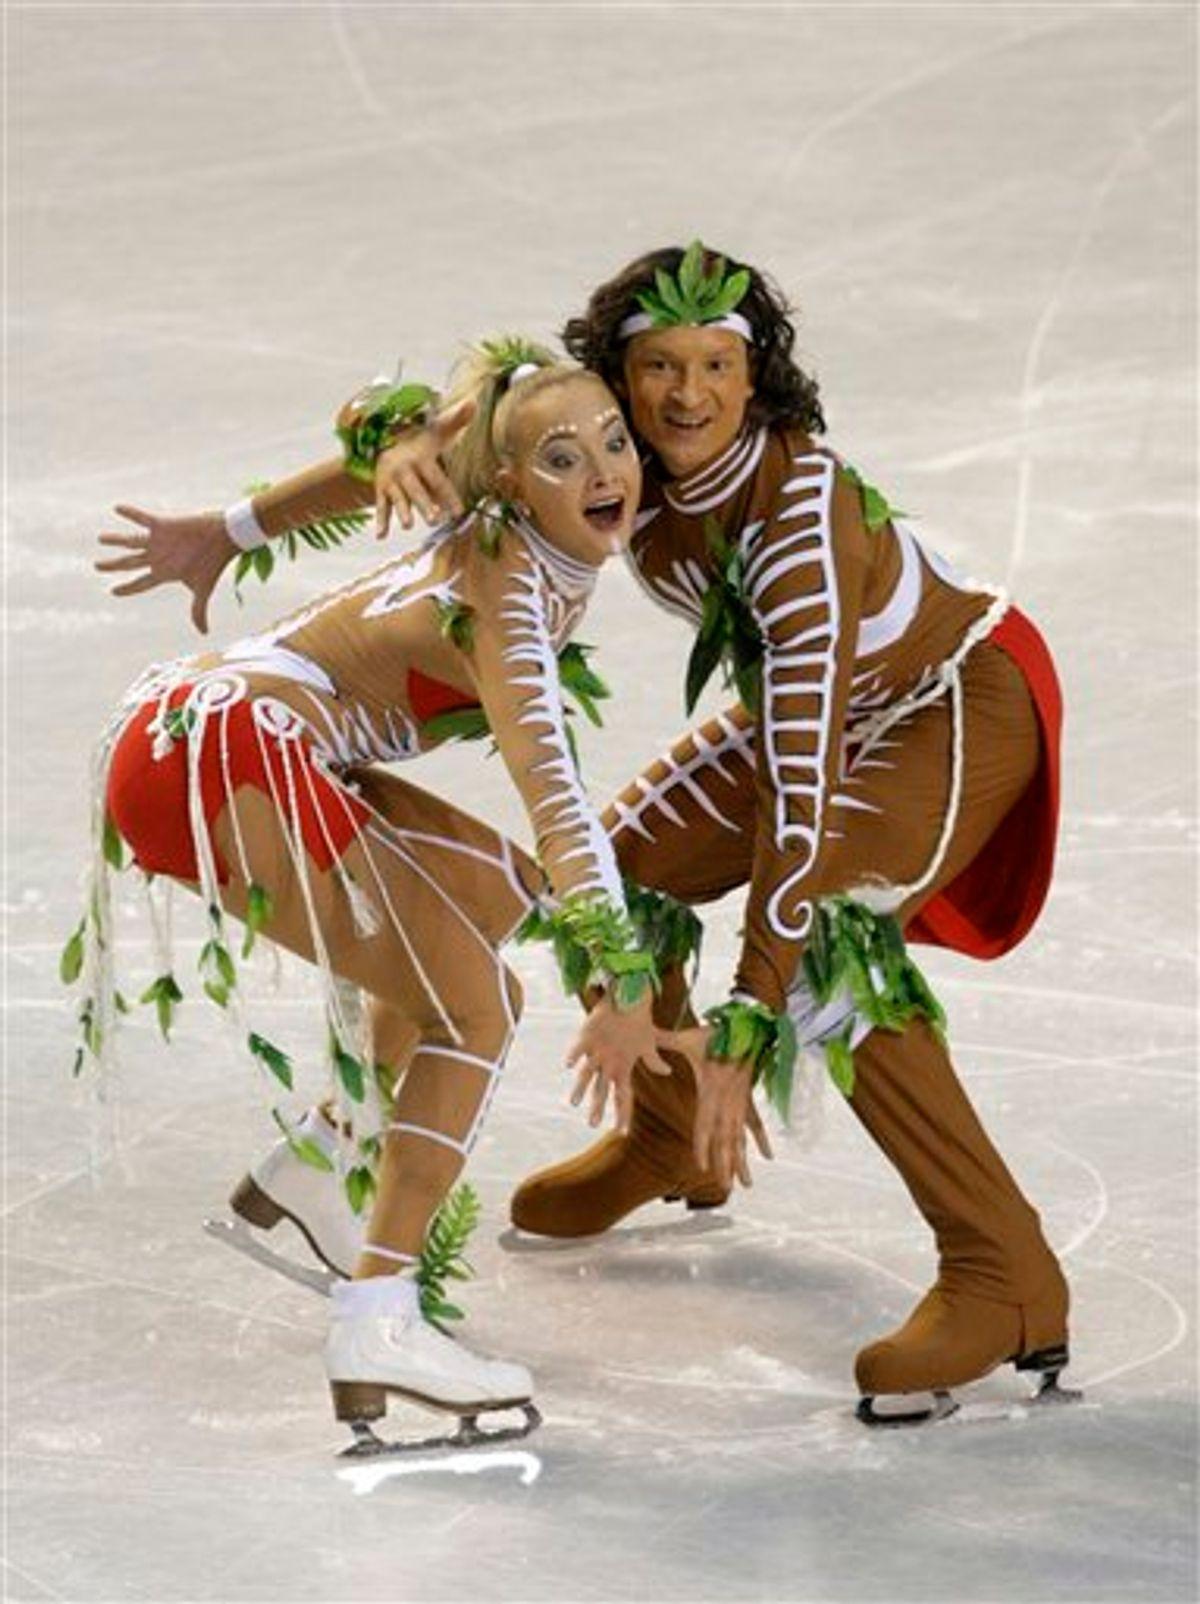 Russia's Oksana Domnina, left, and Maxim Shabalin, right, perform their original dance at the ISU European figure skating championships in Tallinn, Estonia, Thursday, Jan. 21, 2010. (AP Photo/Ivan Sekretarev) (AP)